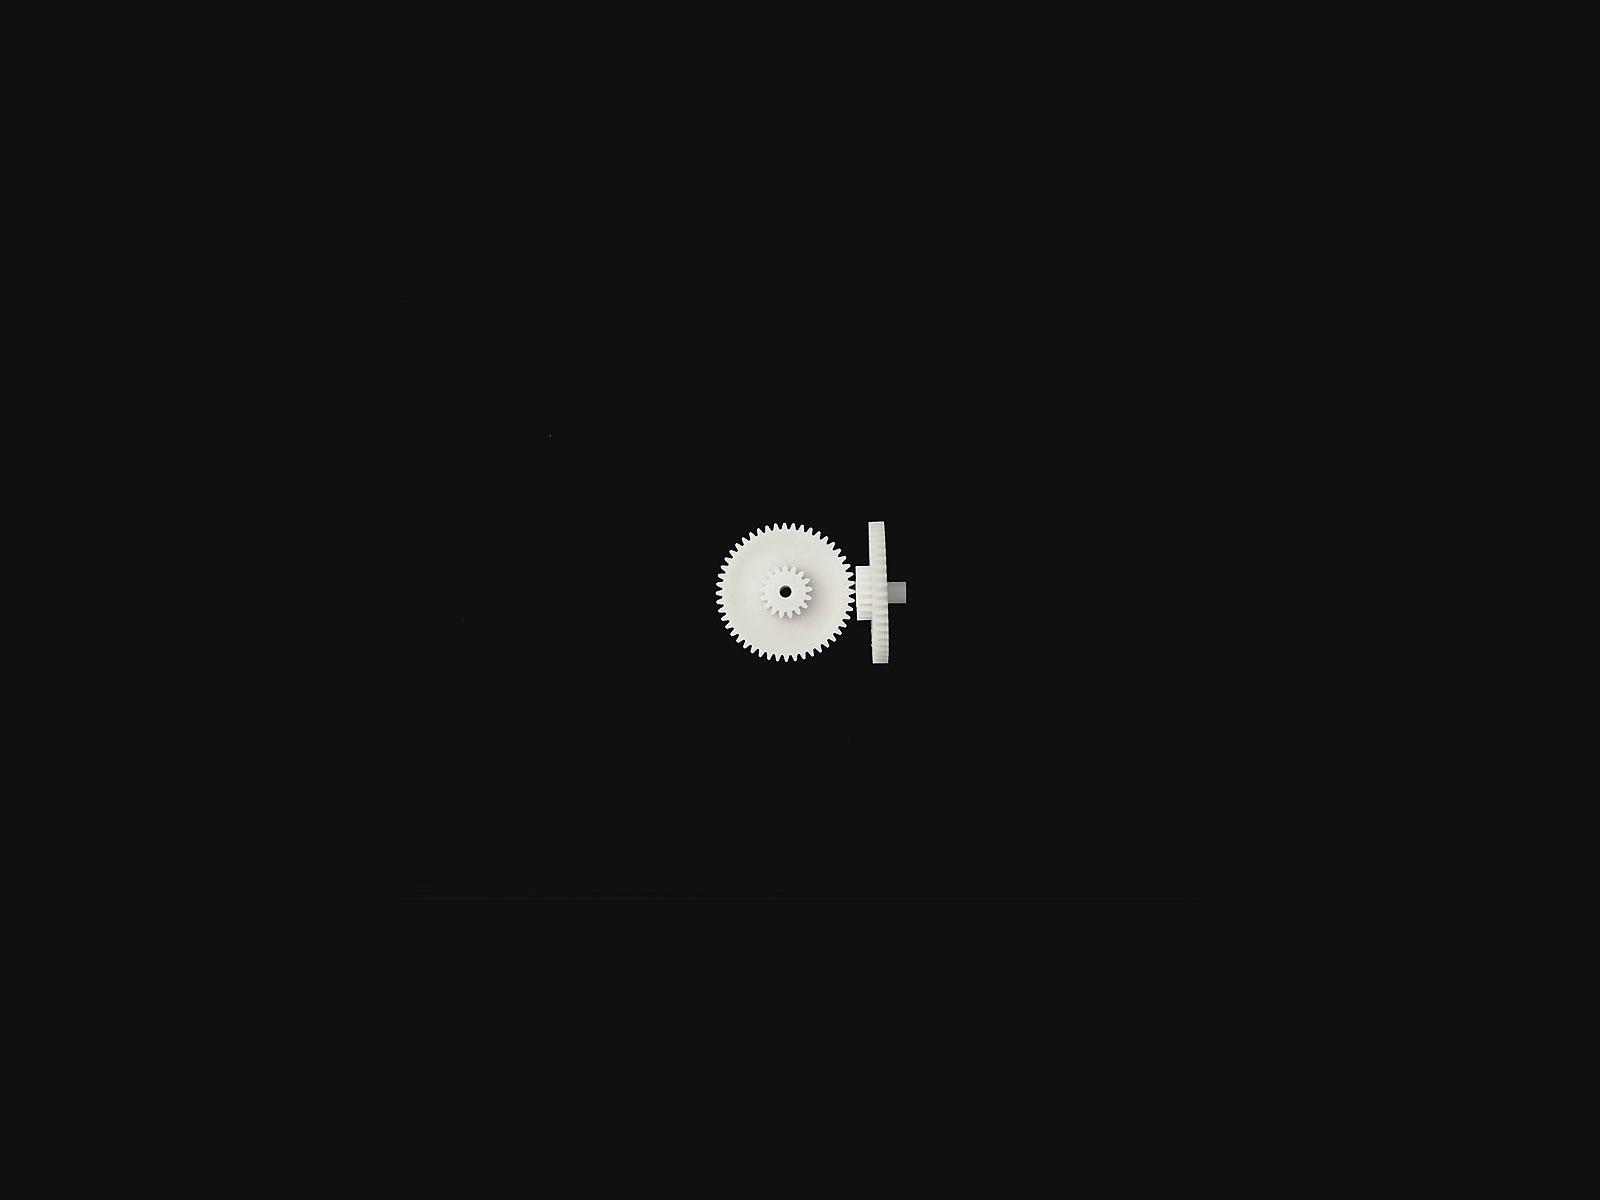 E3 Tacho Zahnrad elektrische Kilometerzähler Kombiinstrumente 48x17